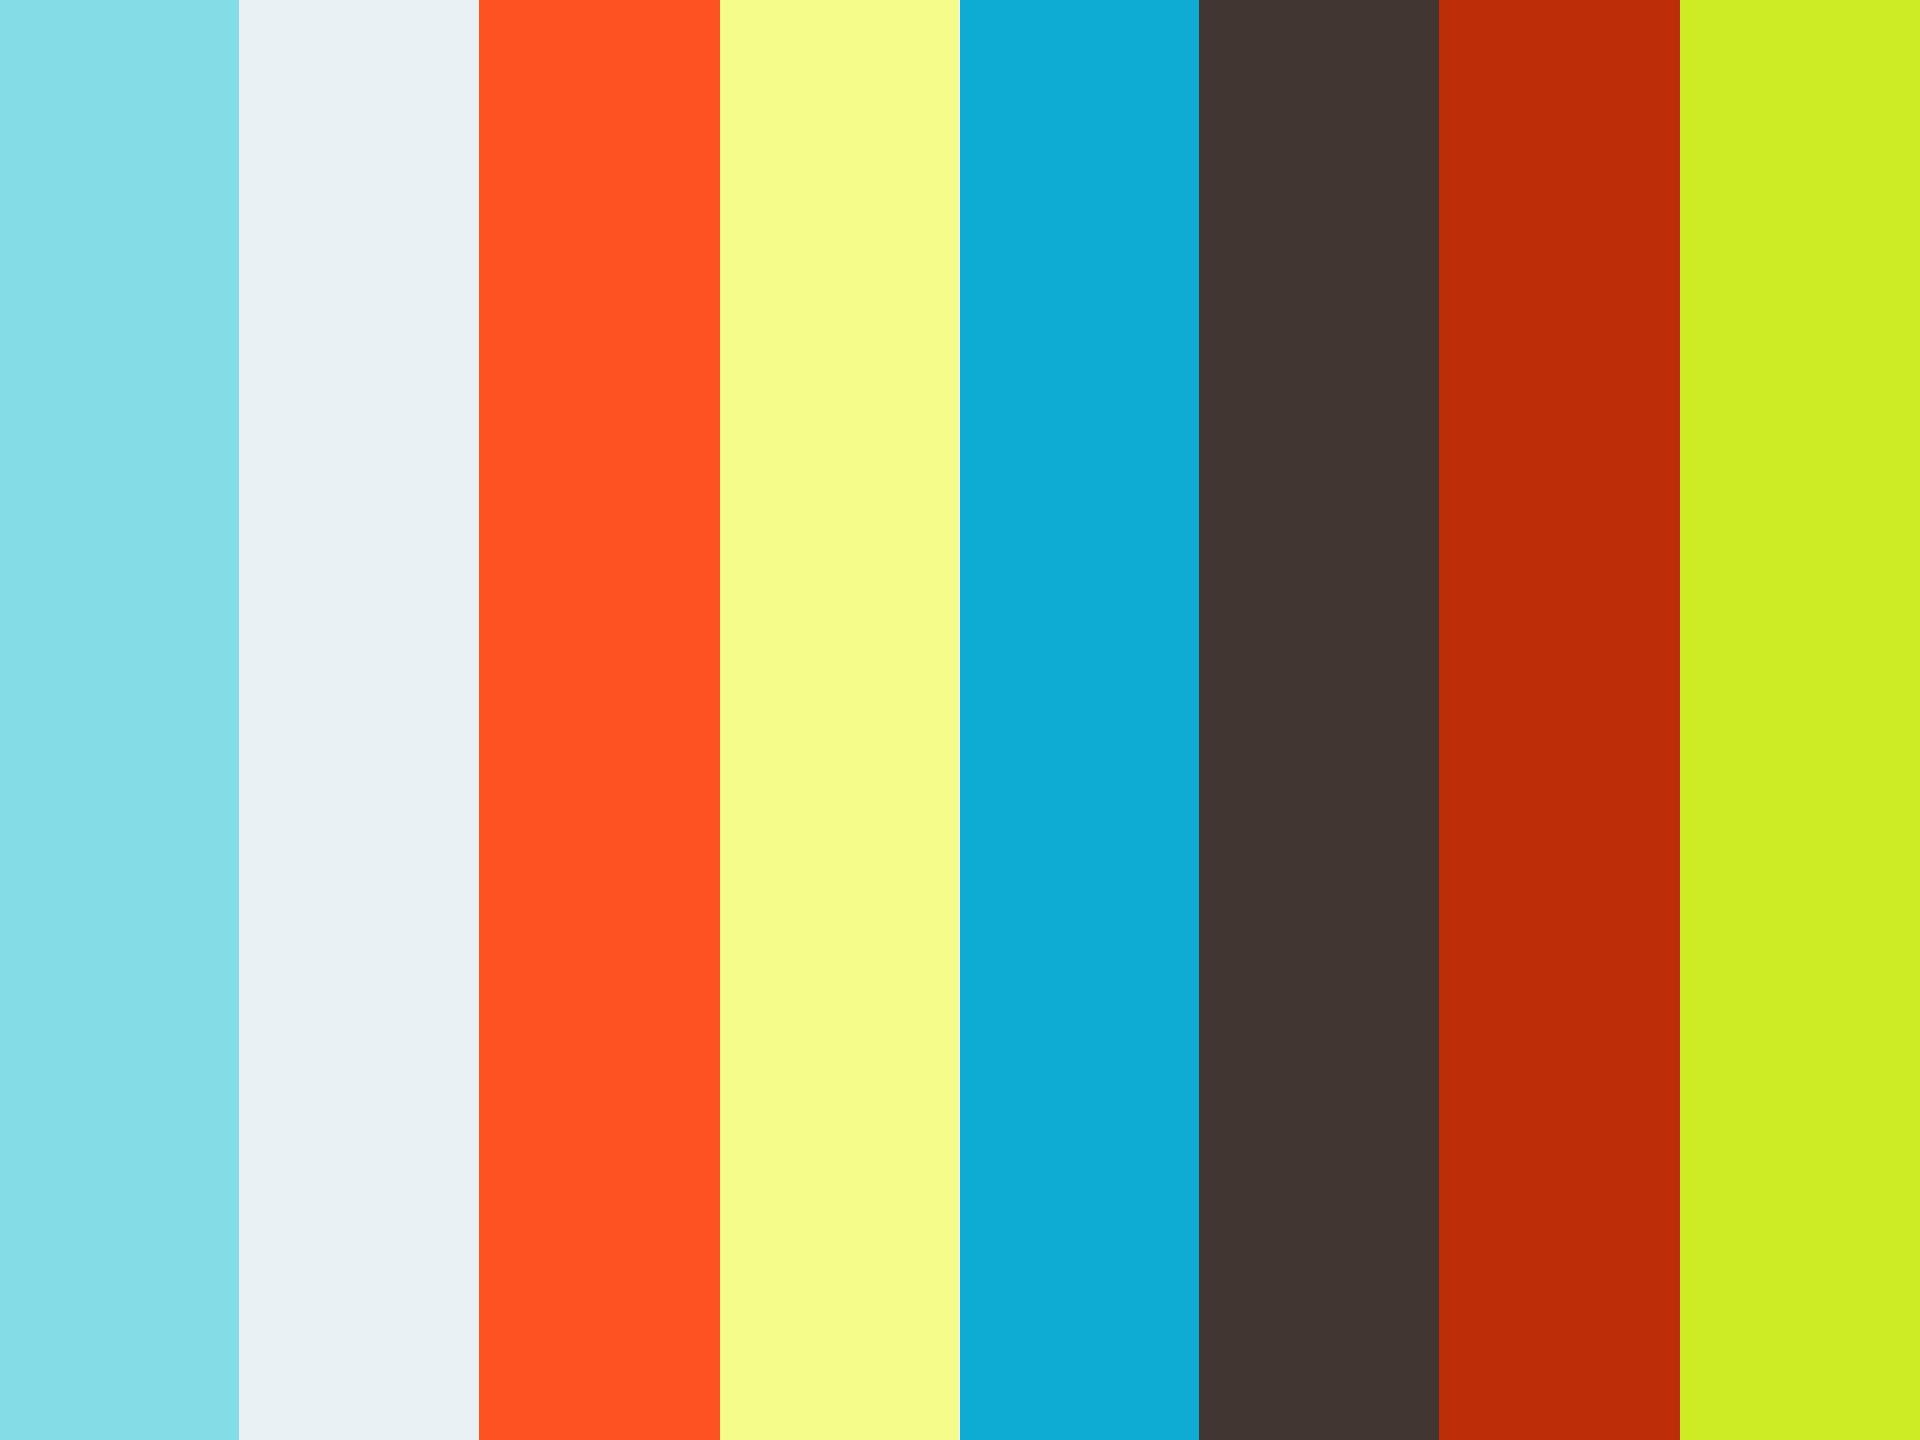 victoria broom interviewvictoria broom wiki, victoria broom actress, victoria broom twitter, victoria broom instagram, victoria broom movies, victoria broom, victoria broom facebook, victoria broom legacy, victoria broom hot, victoria broom age, victoria broom interview, victoria jeffs broom, cape broom victoria, scotch broom victoria bc, the herd victoria broom